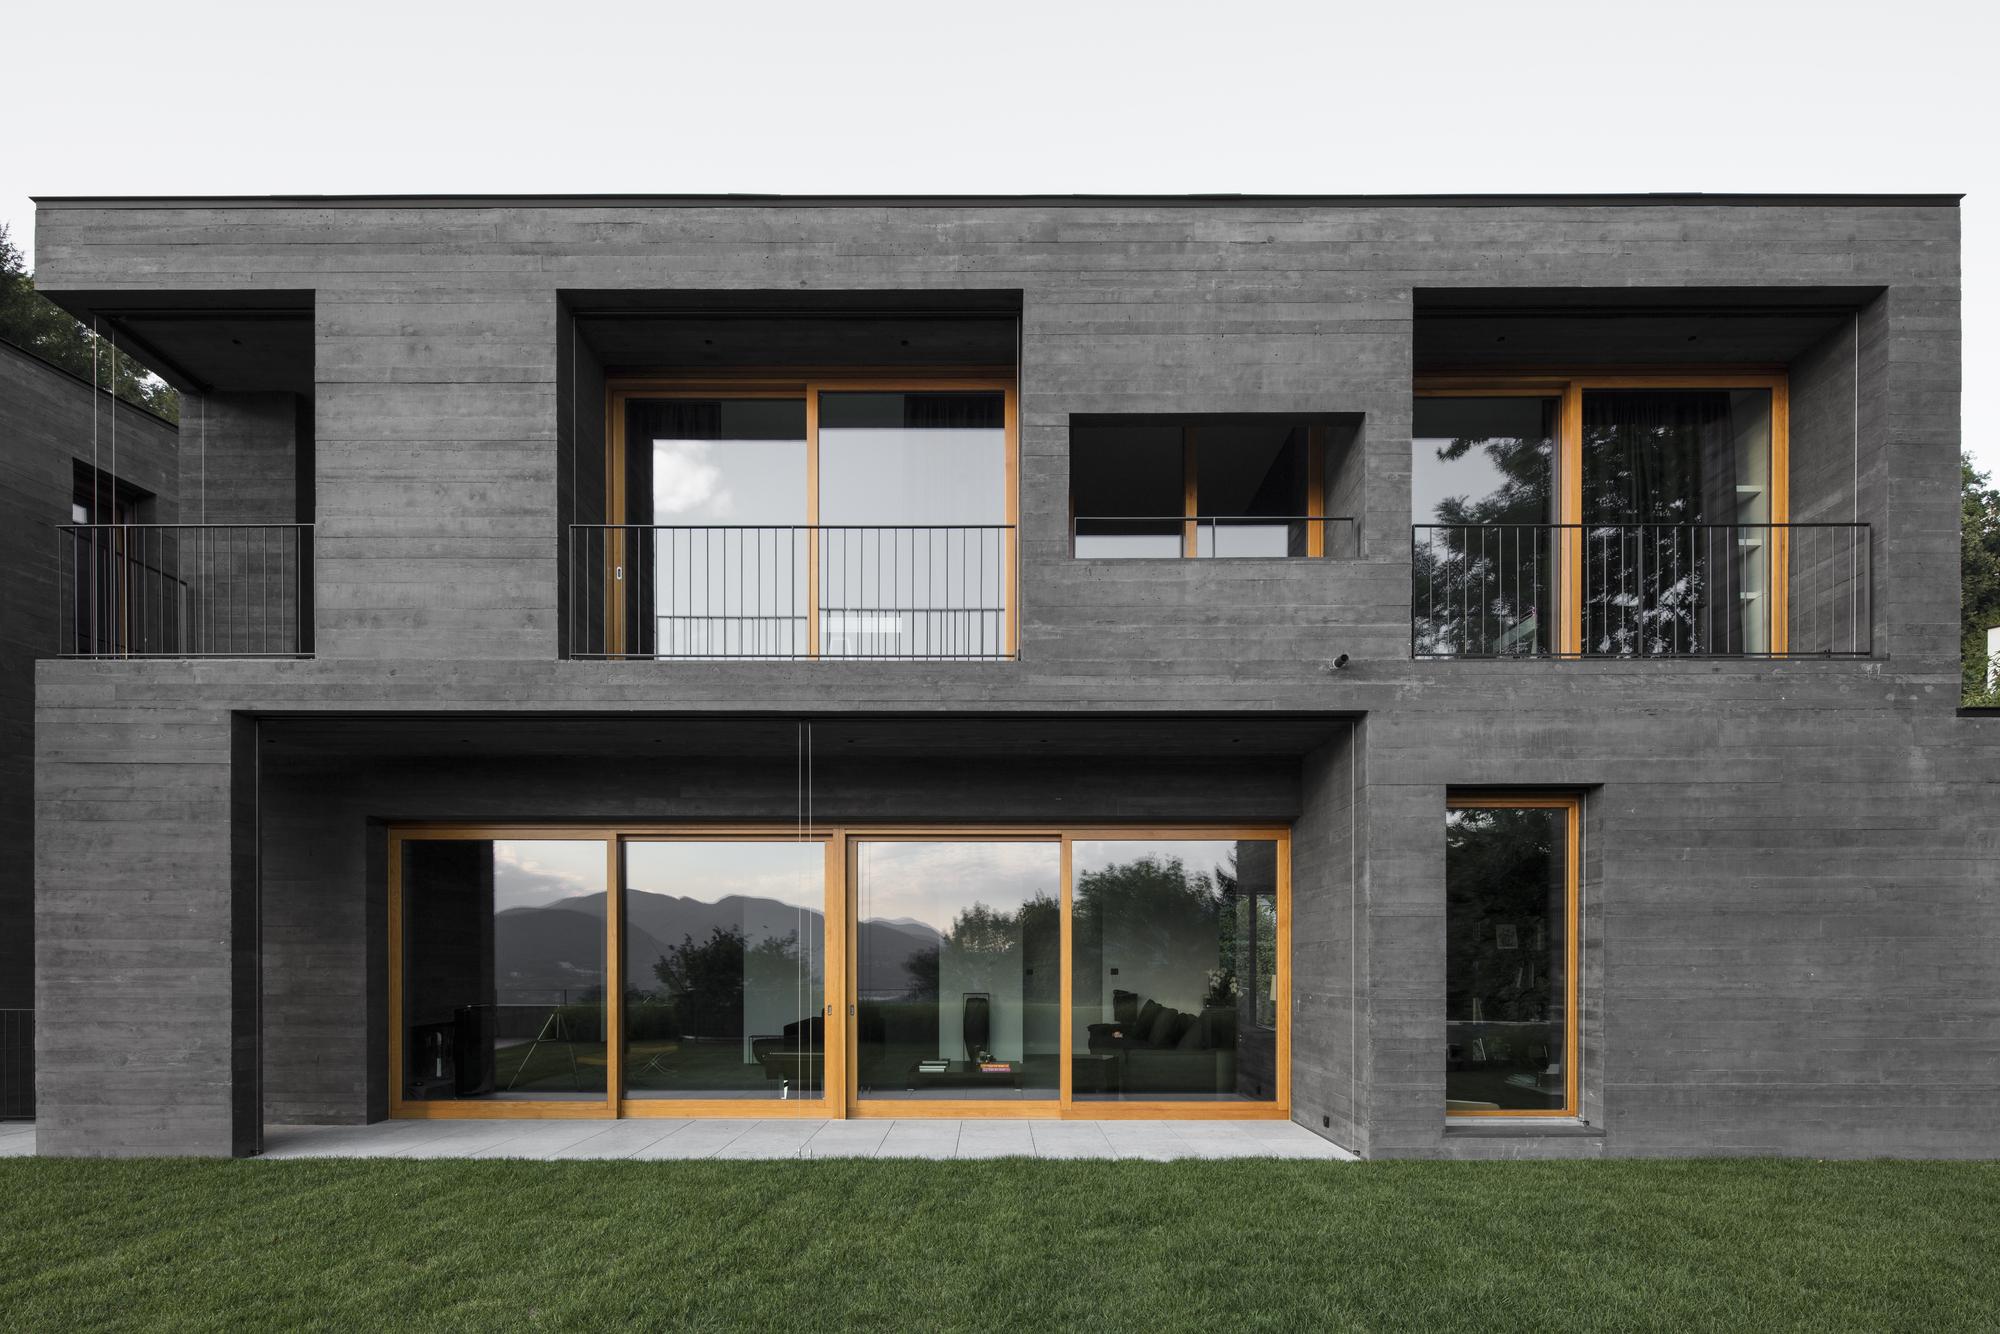 Villa Montagnola / Attilio Panzeri & Partners